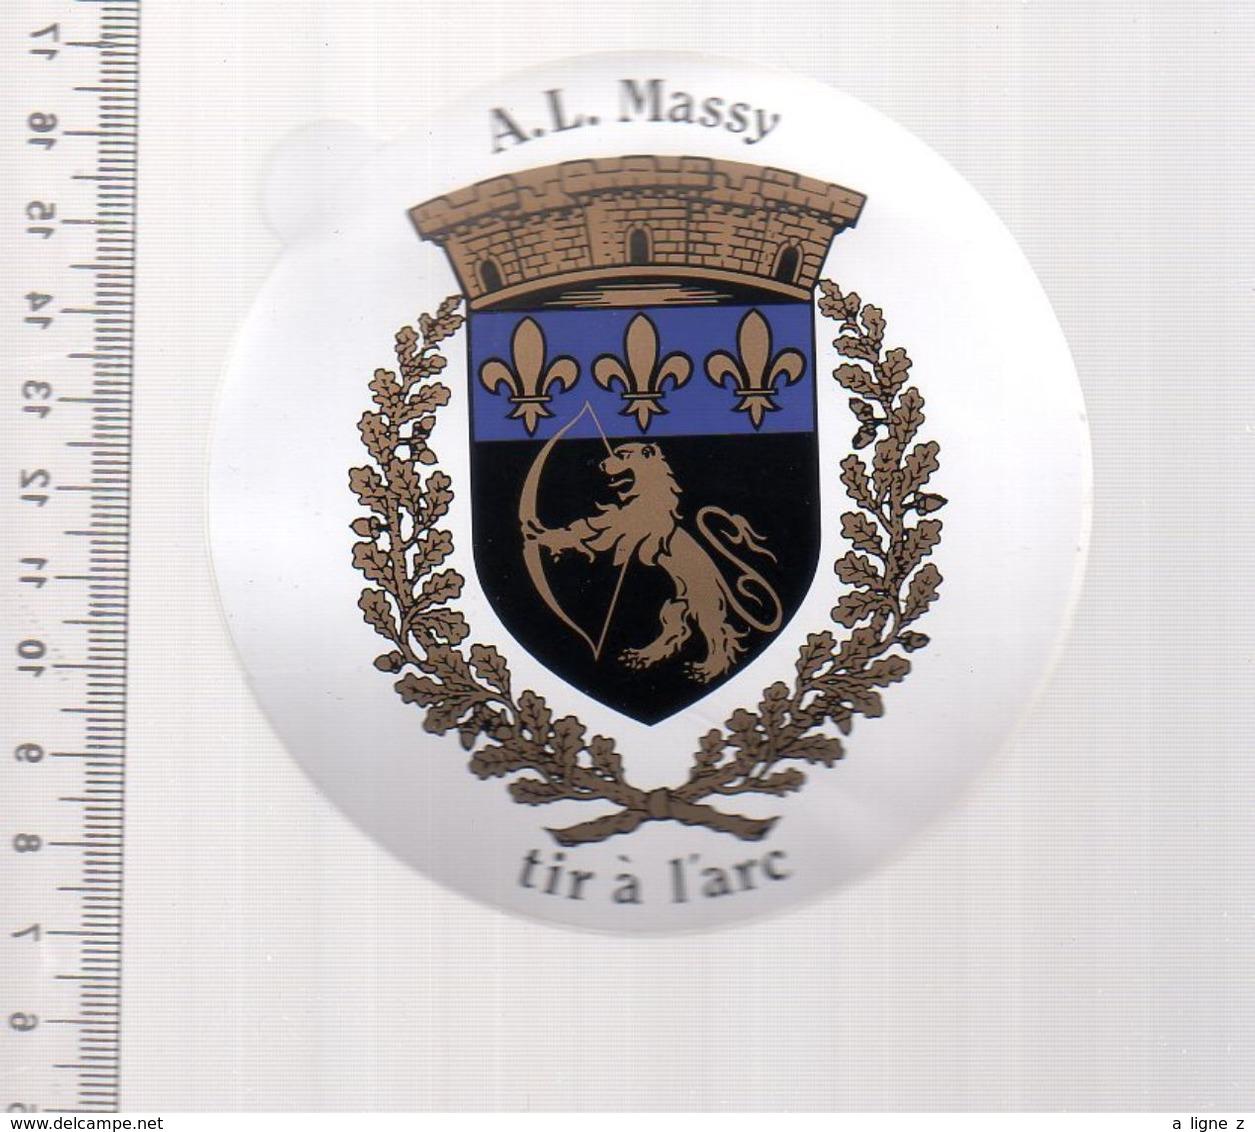 REF 10 : Autocollant Sticker Thème TIR A L'ARC Archerie Archer Compagnie Club Massy - Tir à L'Arc